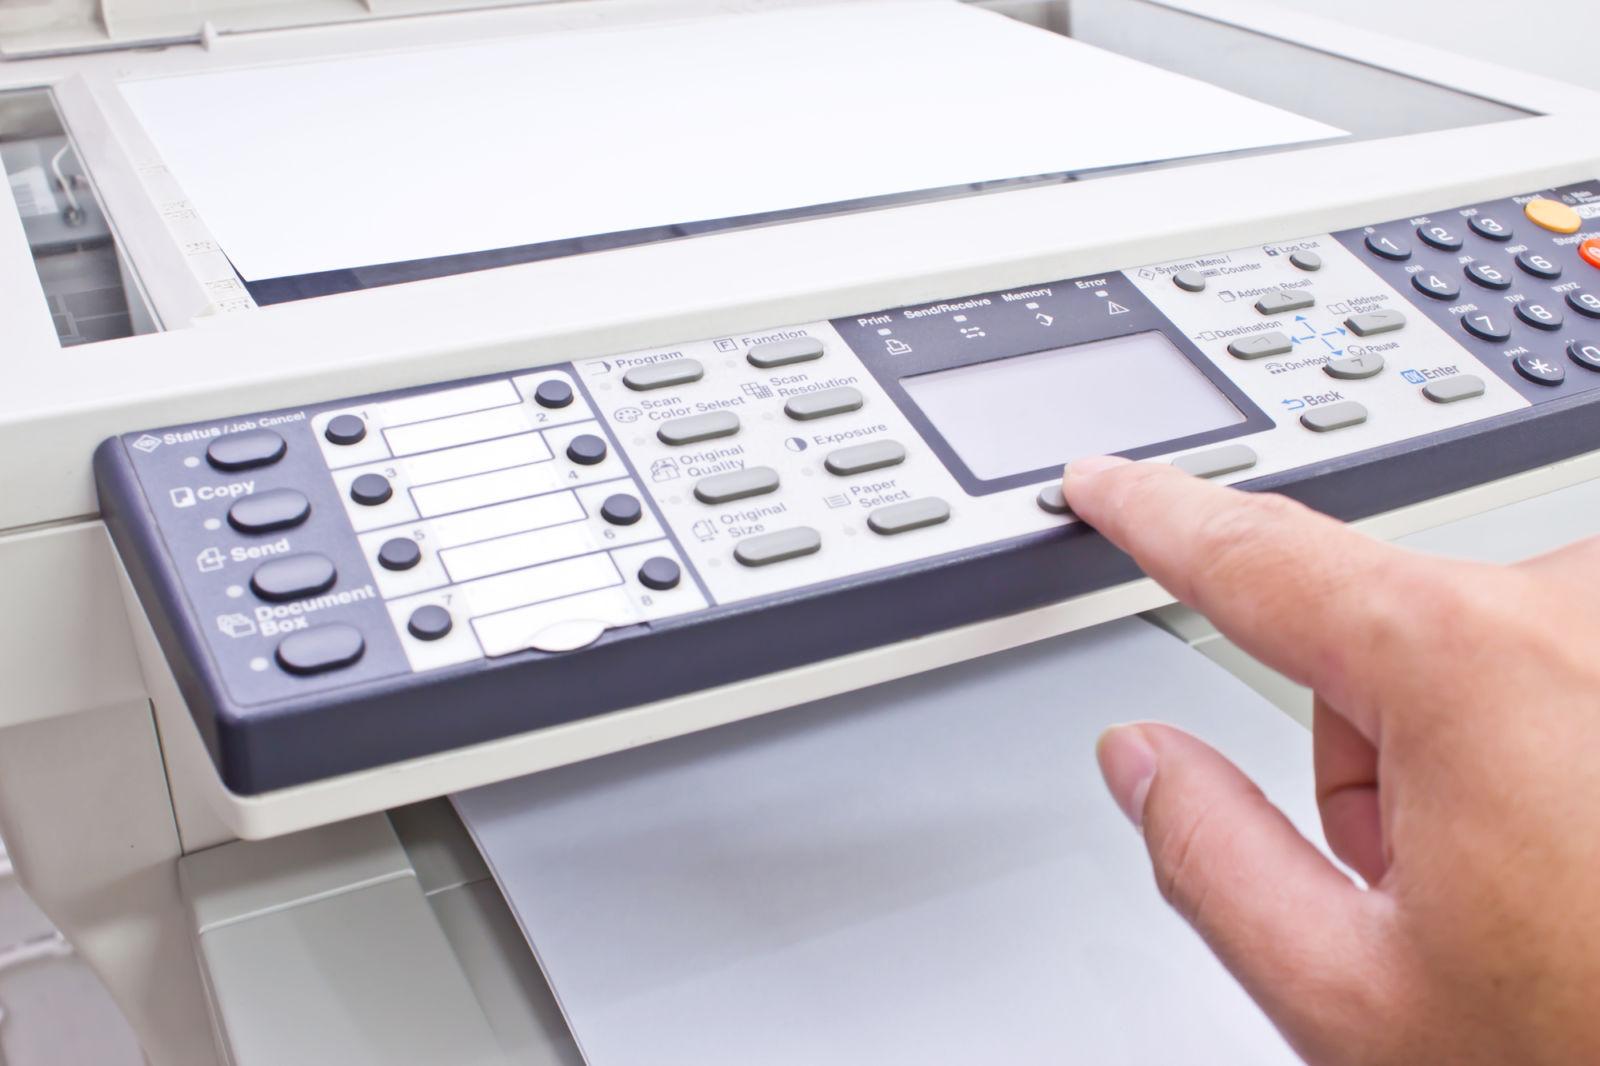 Zoek je hewlett-Parkard HP DesignJet T730 Large Format Wireless Plotter voor je (thuis)kantoor in Boskoop?